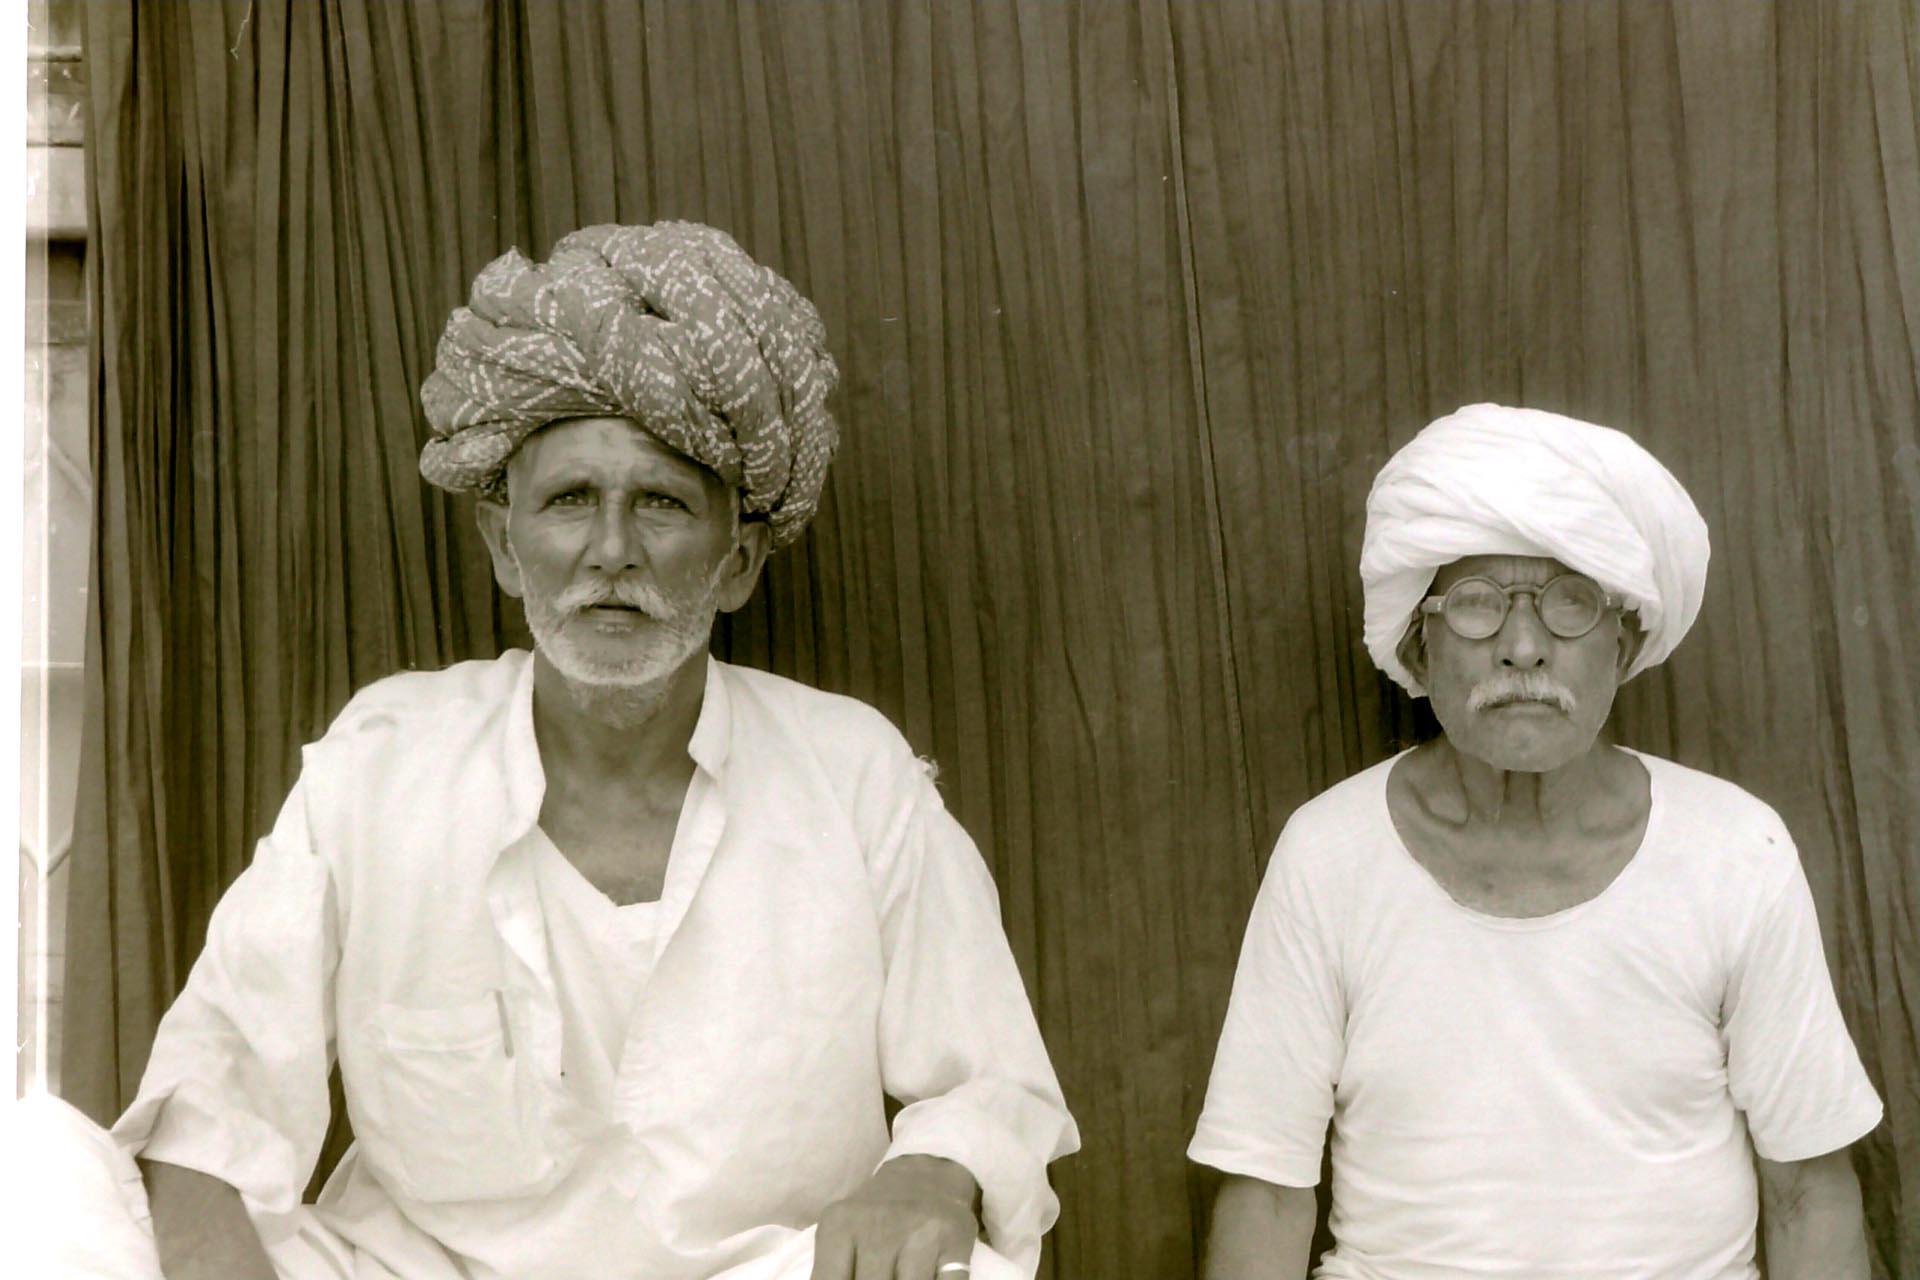 023-Uomini del Rajasthan dal fotografo,India 1990